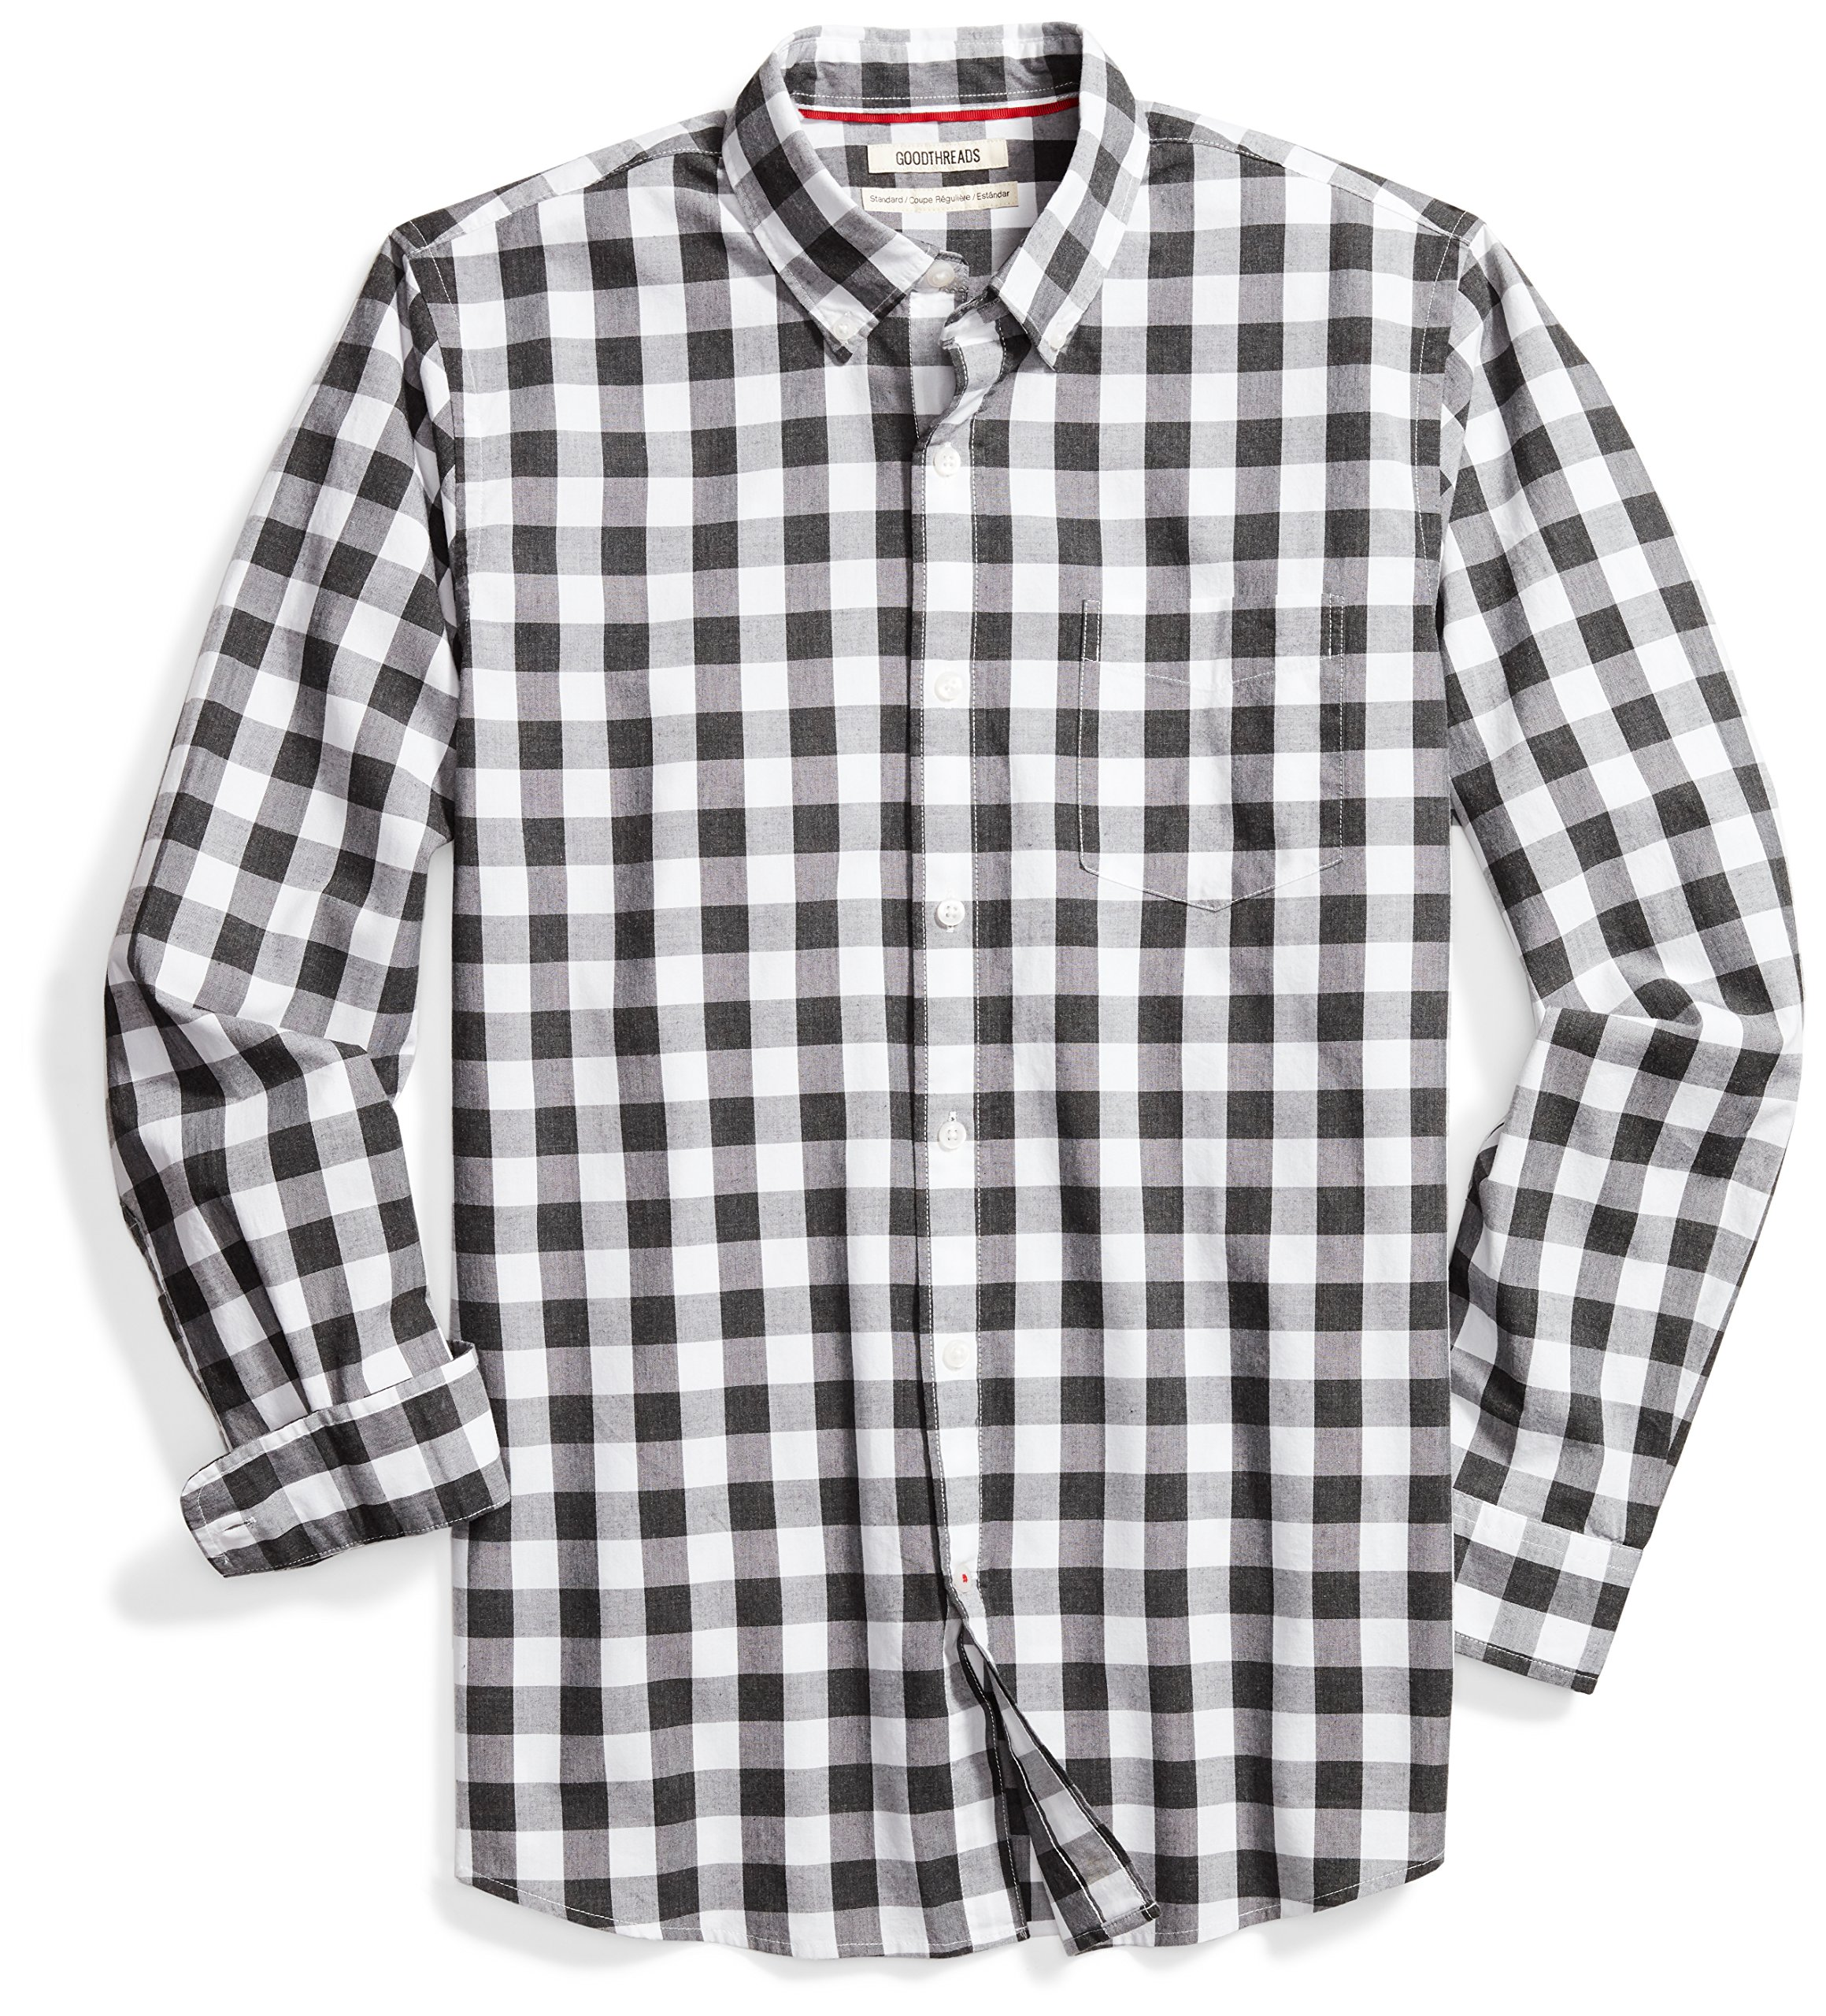 Goodthreads Men's Standard-Fit Long-Sleeve Heathered Large-Scale Check Shirt, White/Grey, Medium